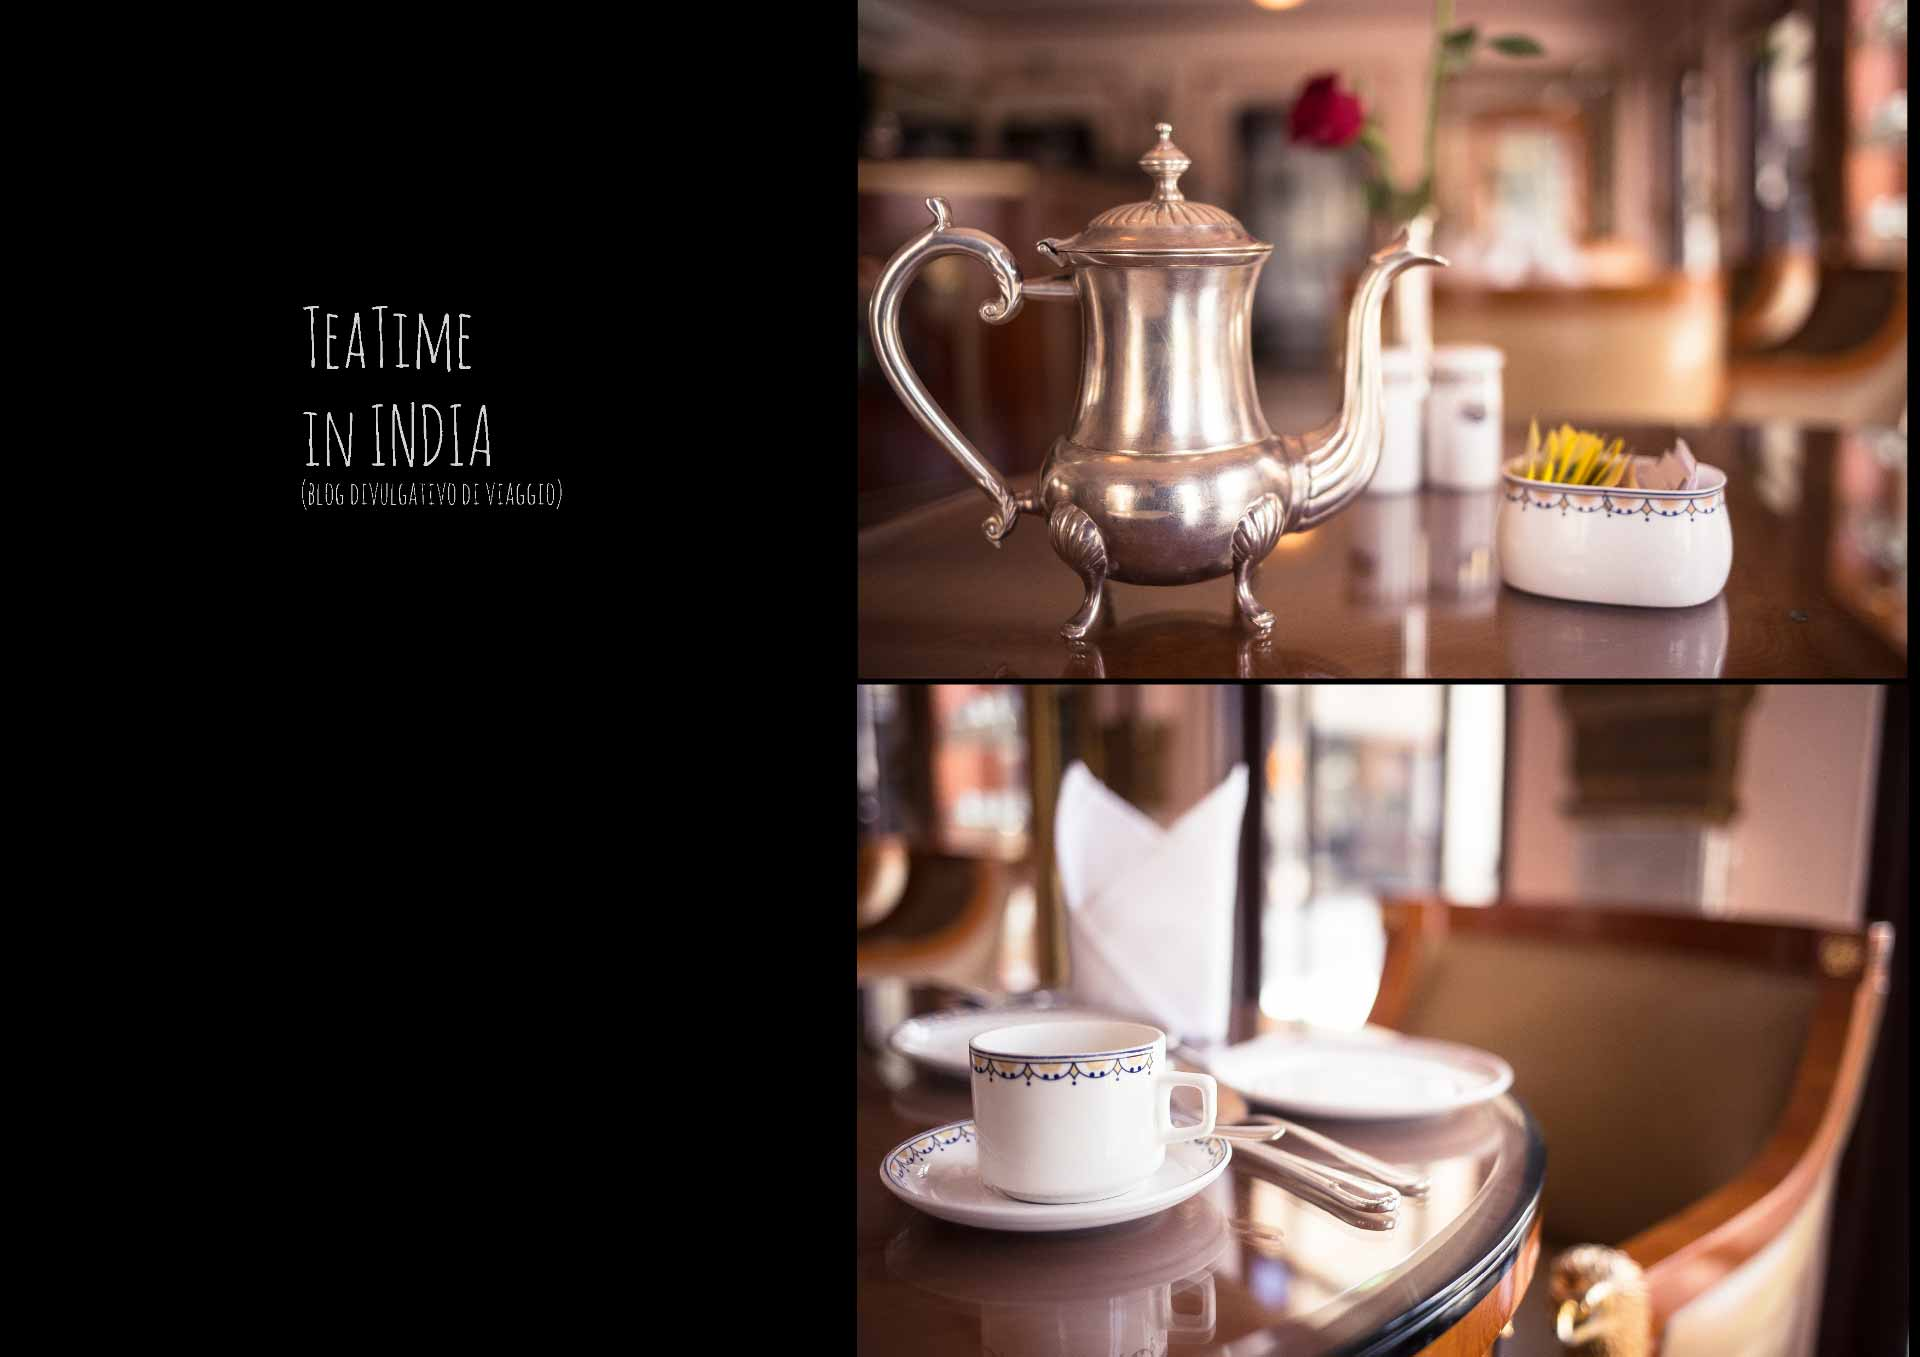 teatime in india